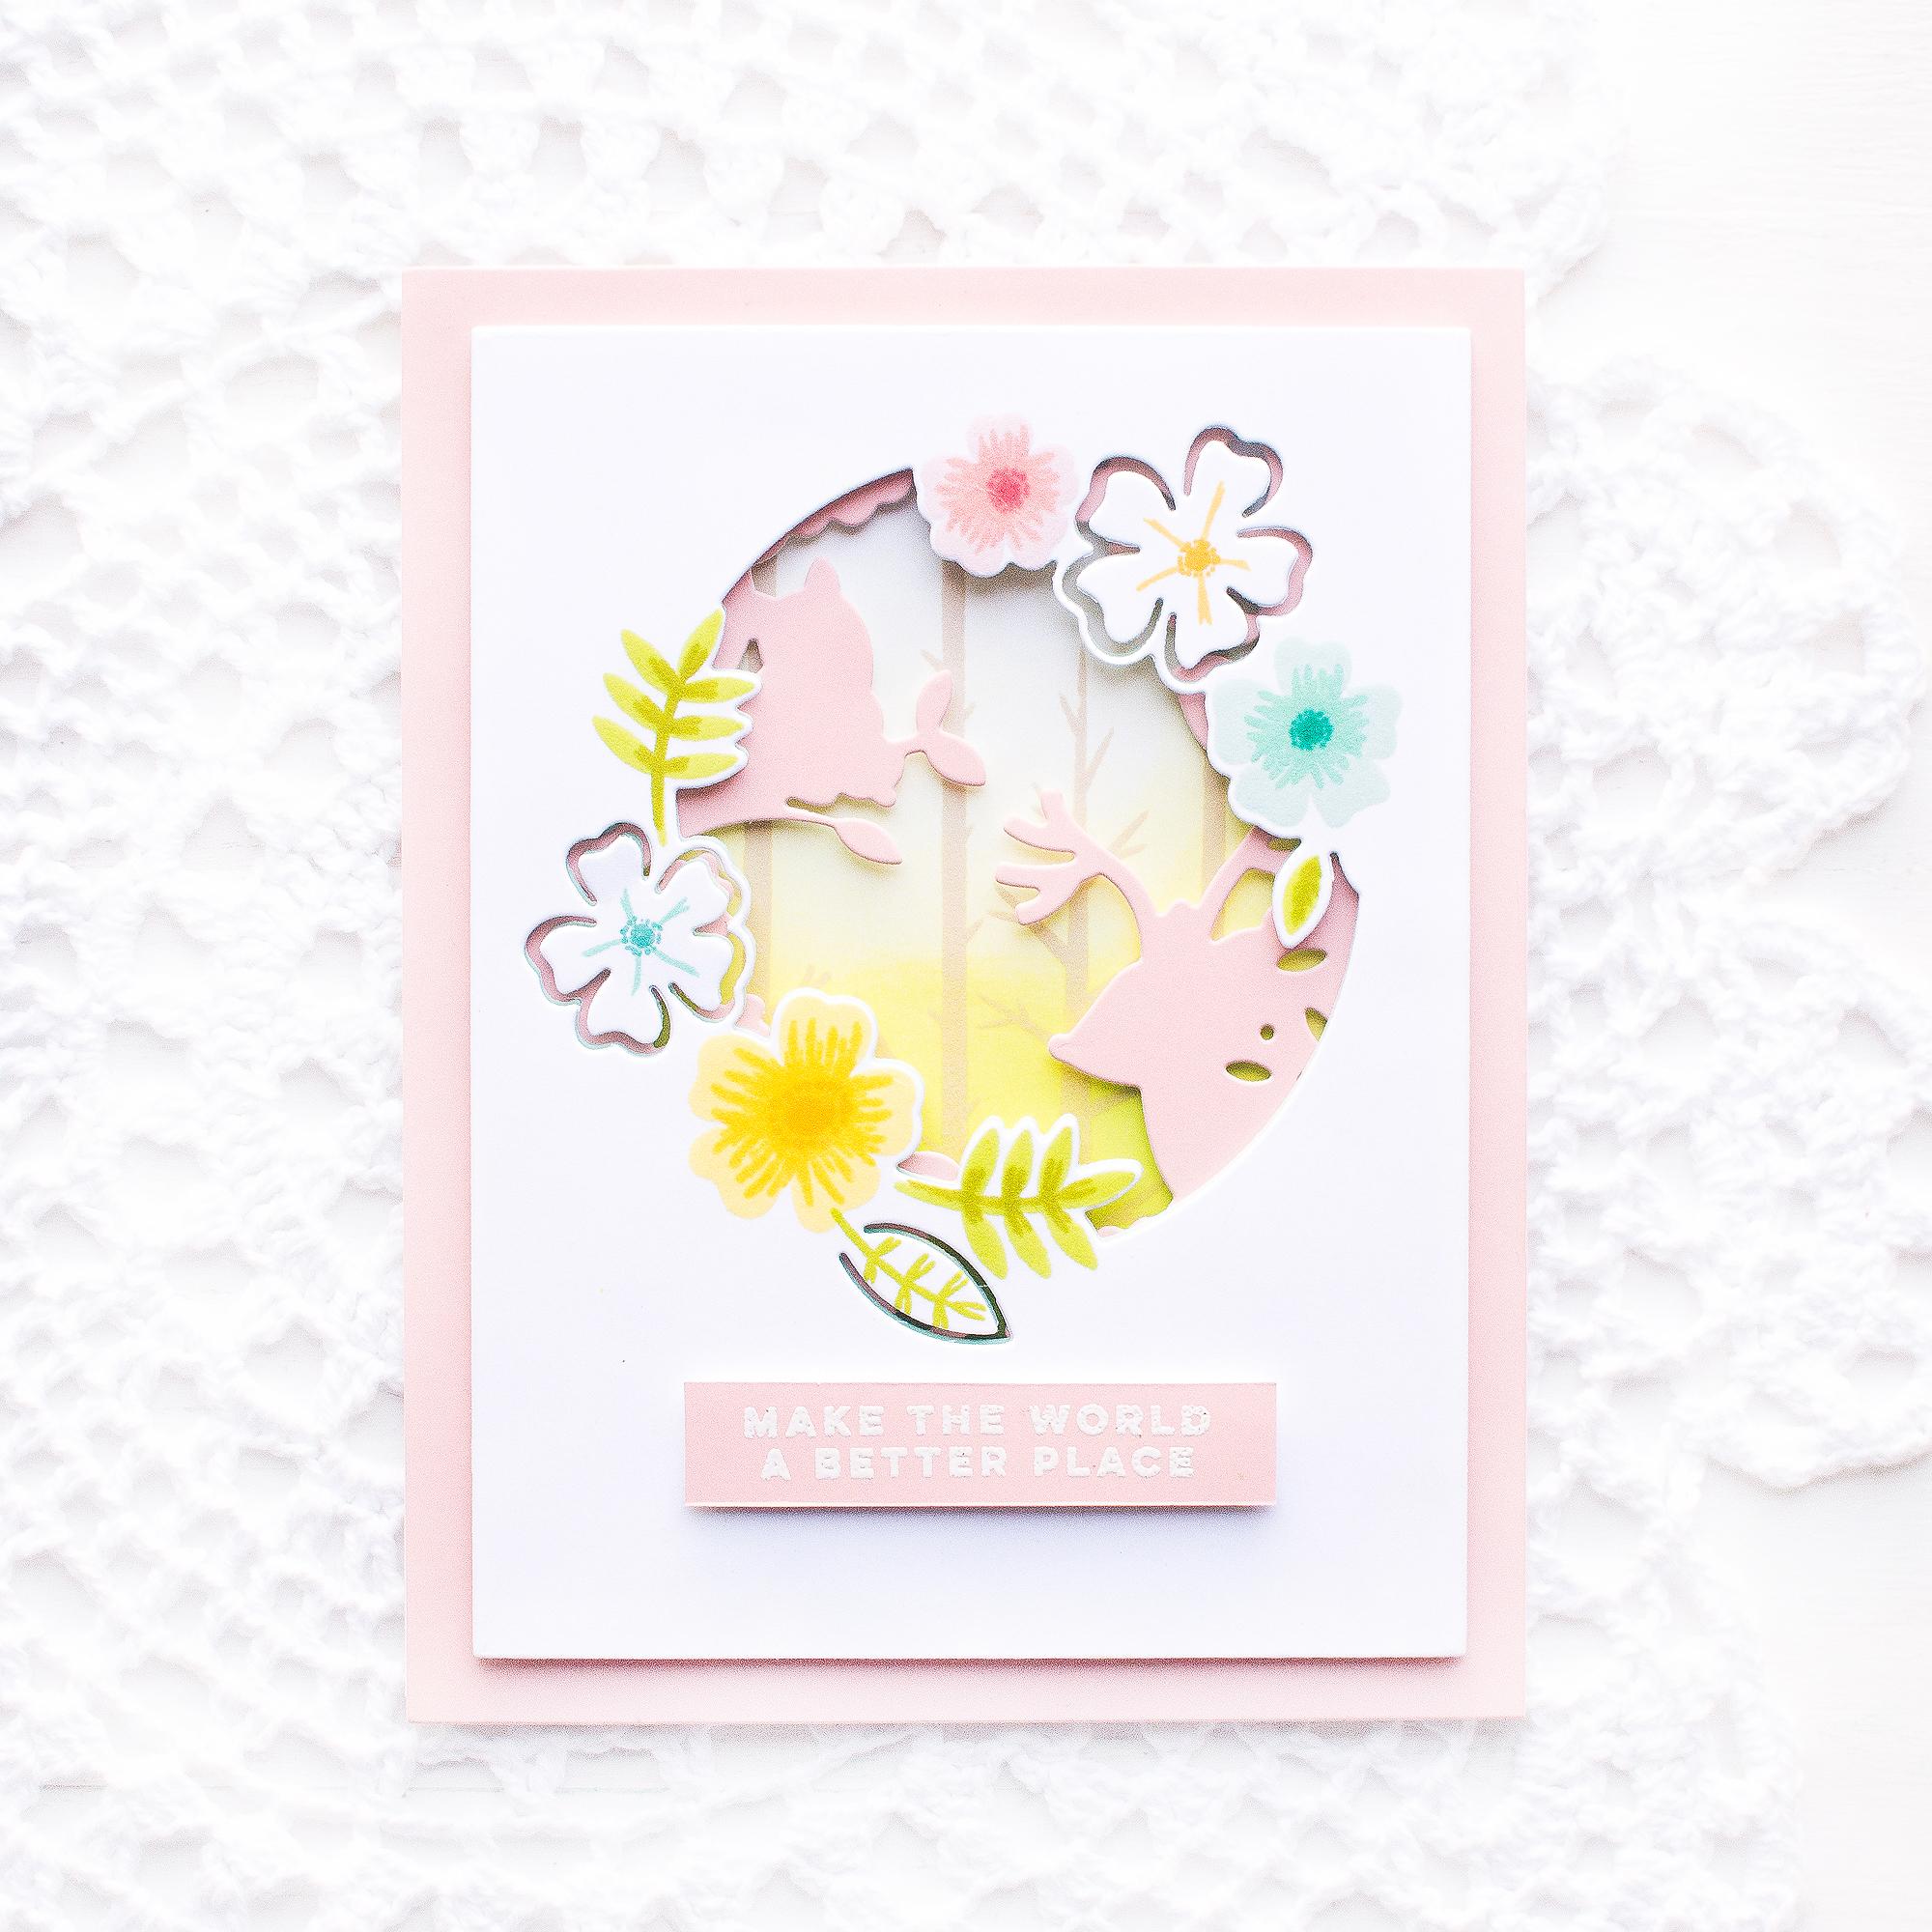 pink-fresh-studio-scrapbook-cards-today-magazine-feature